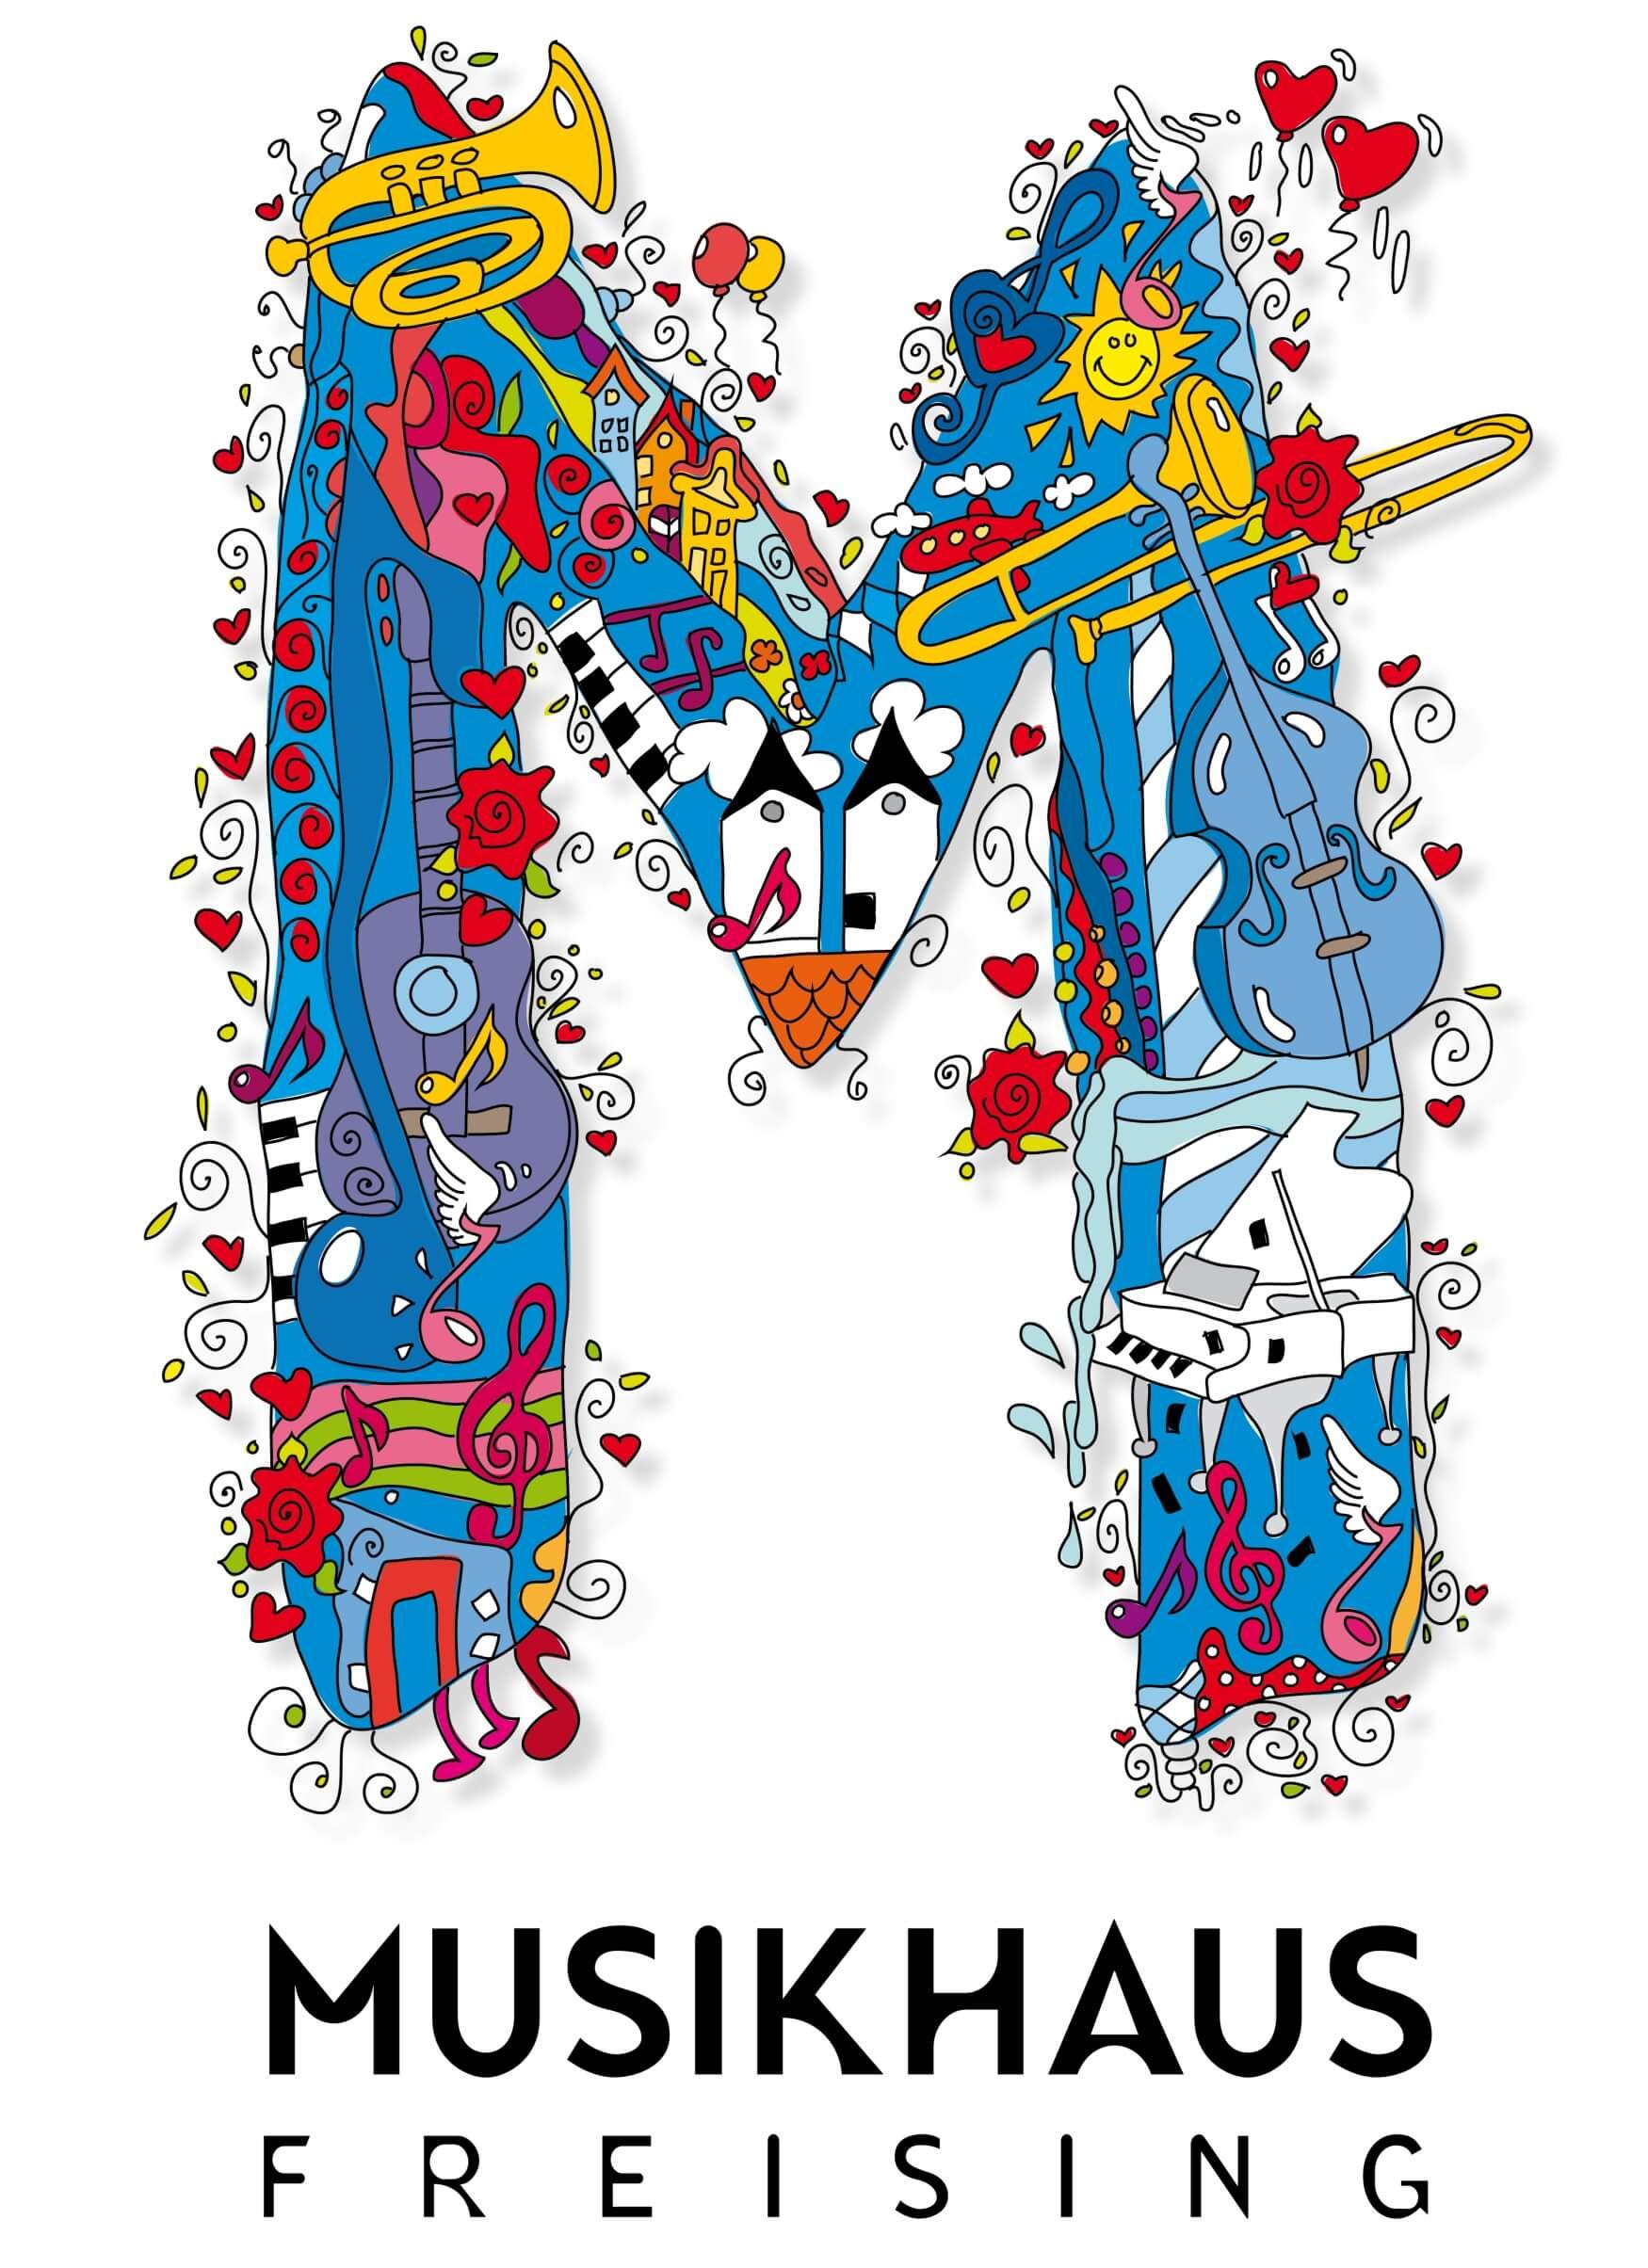 Gitarrenladen München LogoMusikhaus